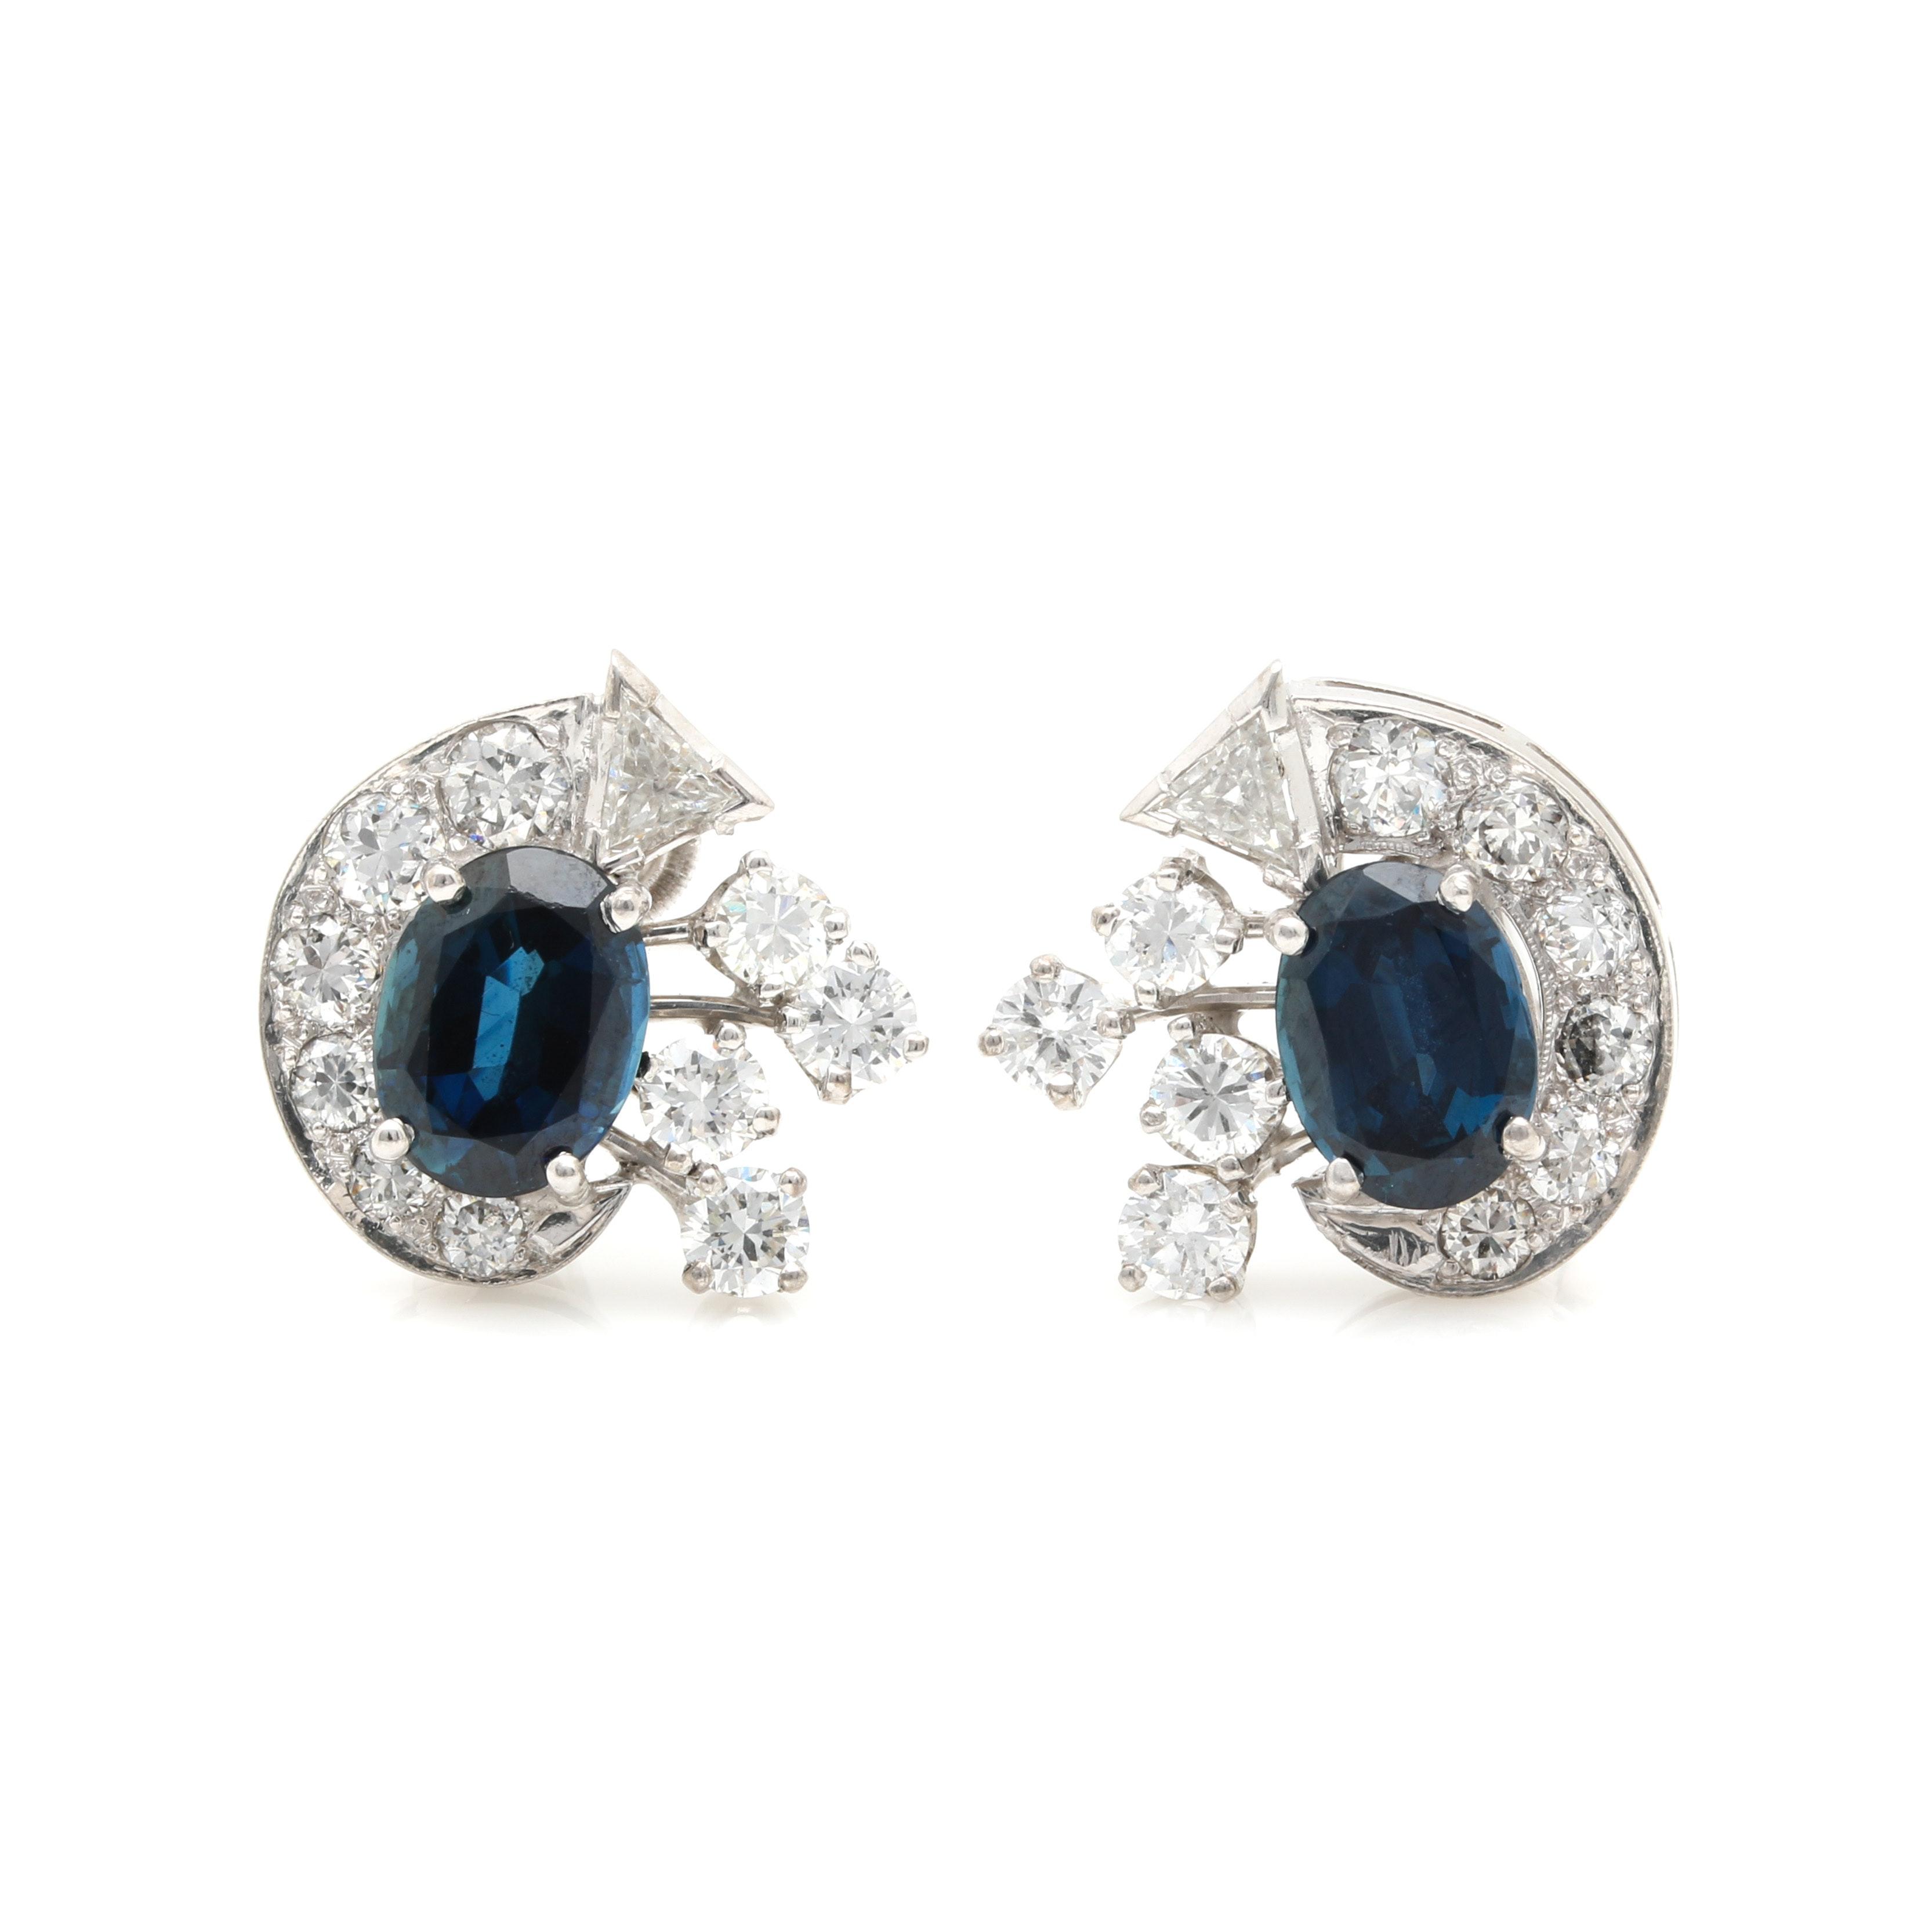 Platinum 5.00 CTW Sapphire and 2.48 CTW Diamond Earrings